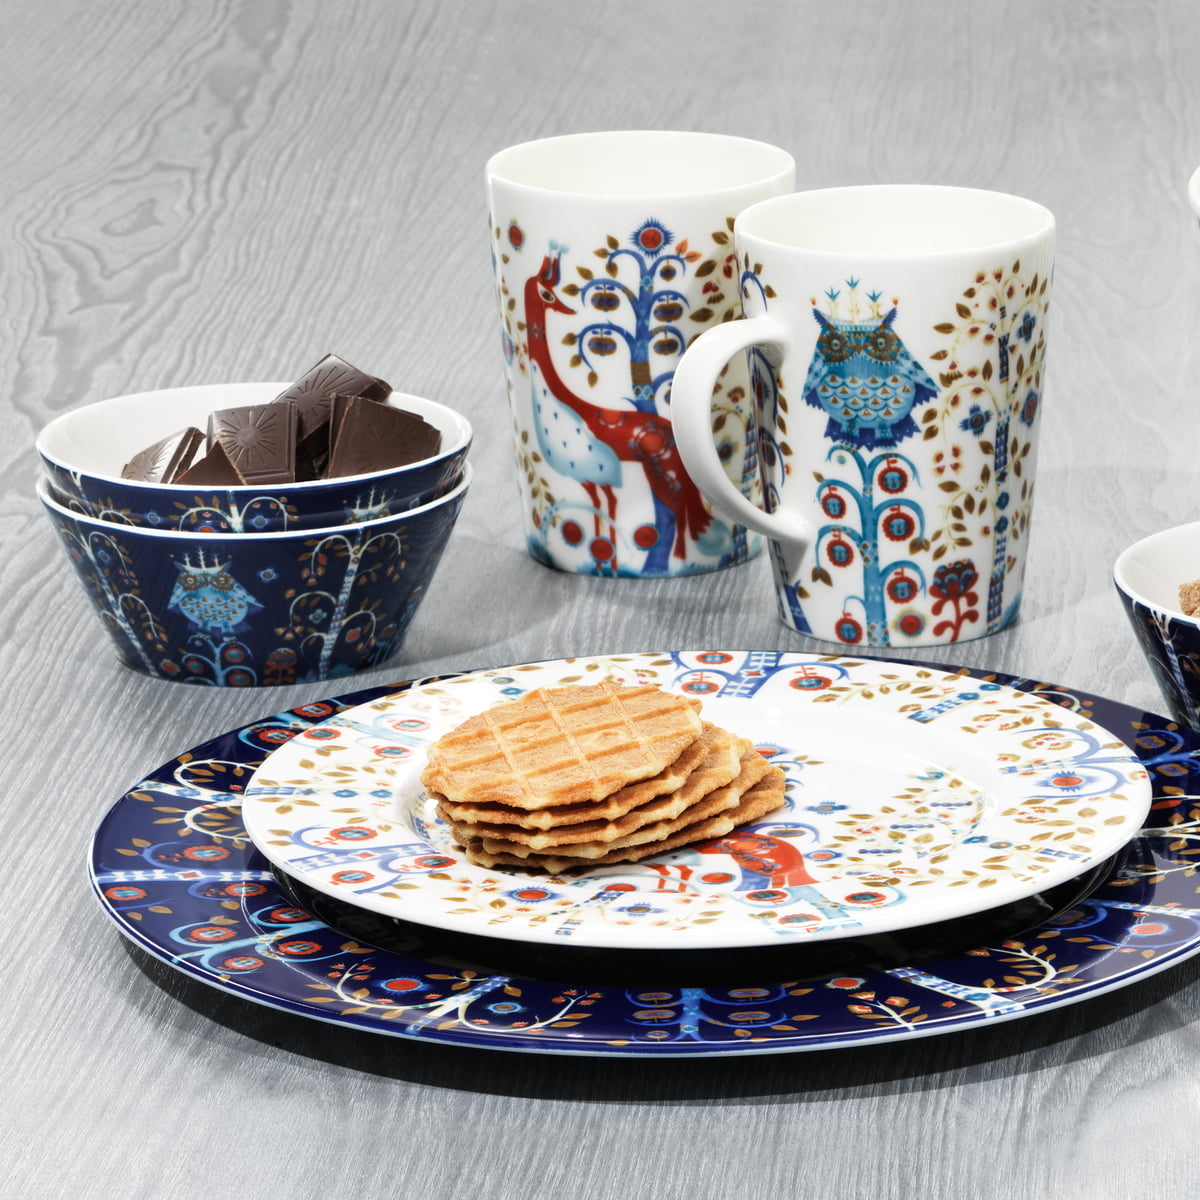 Iittala Taika group blue - ambience image & Taika - blue by Iittala in the home design shop